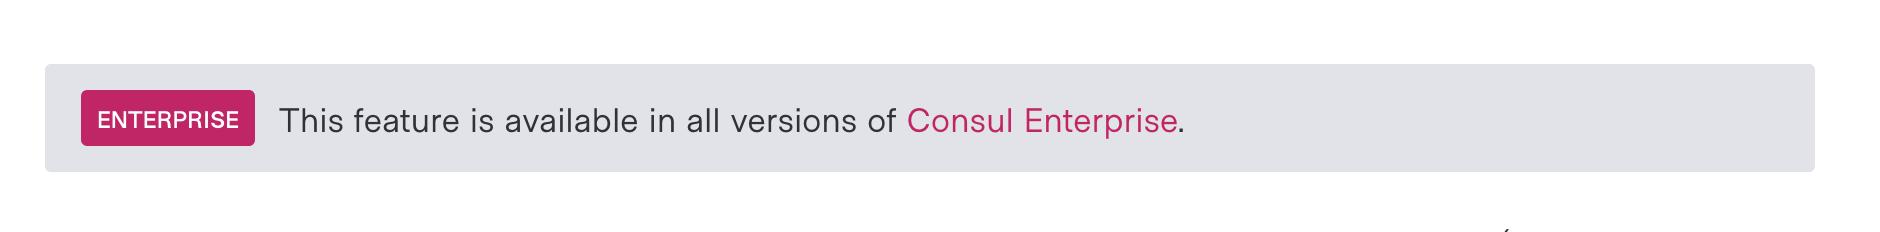 Enterprise Alert Component - Standalone